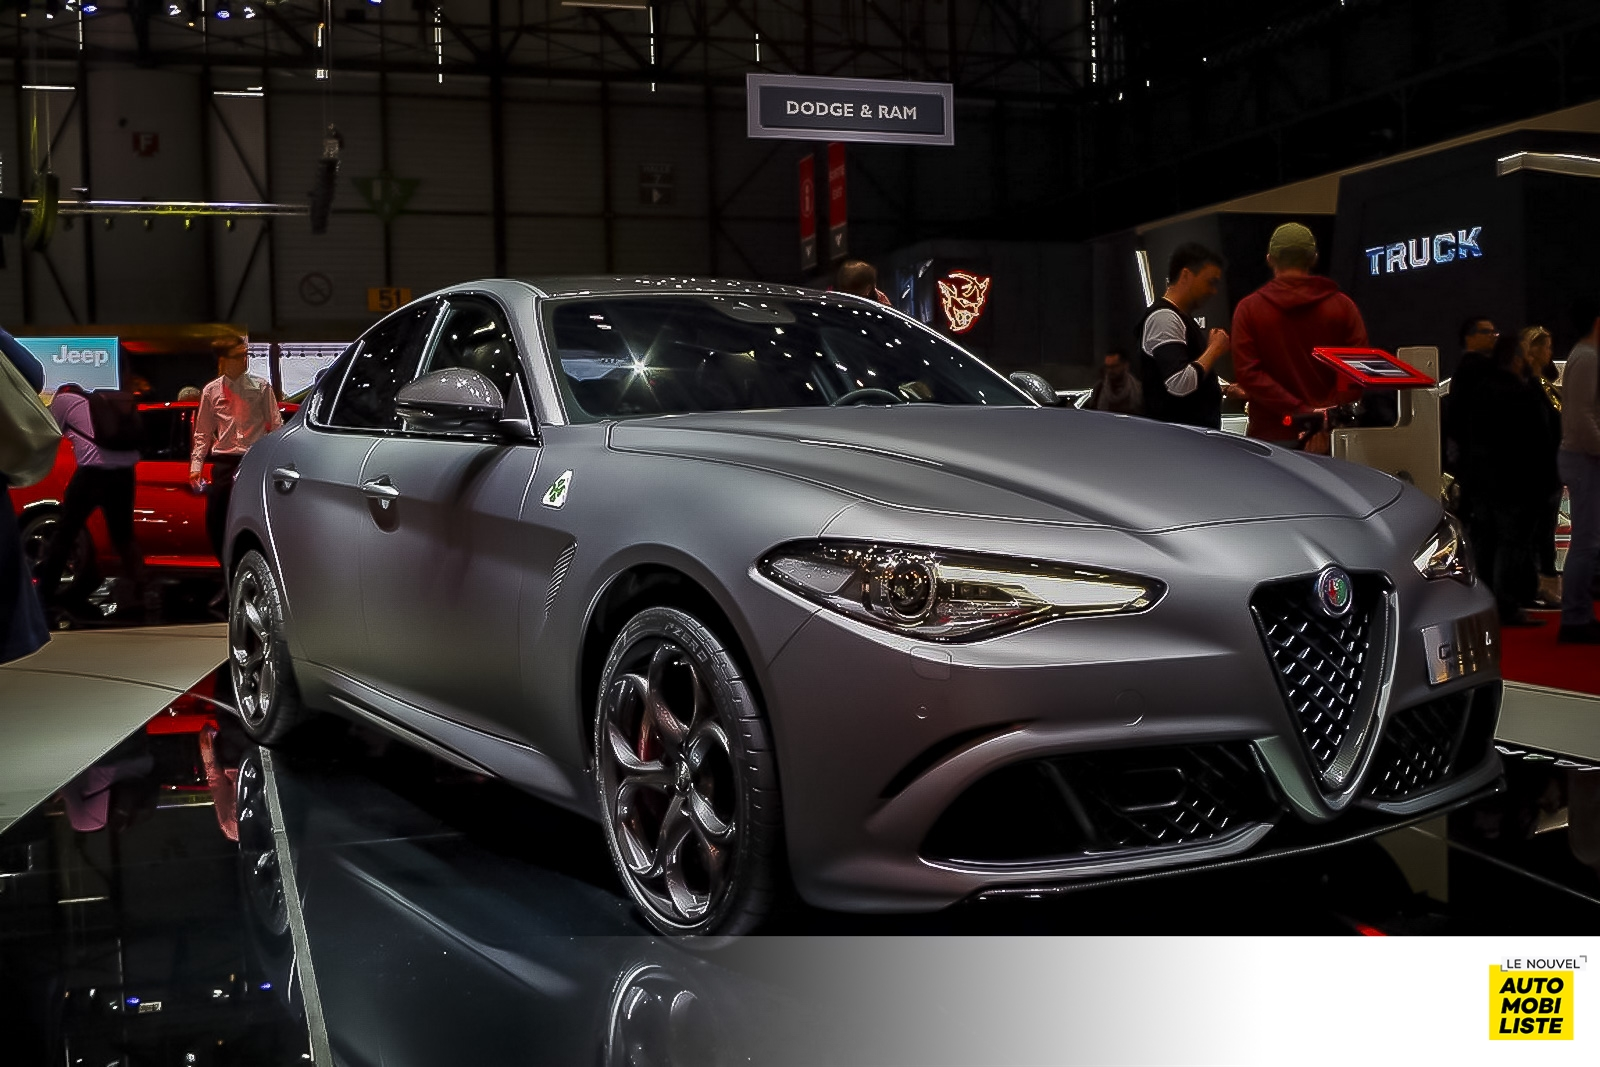 Geneve 2018 Alfa Romeo LeNouvelAutomobilisteG 17